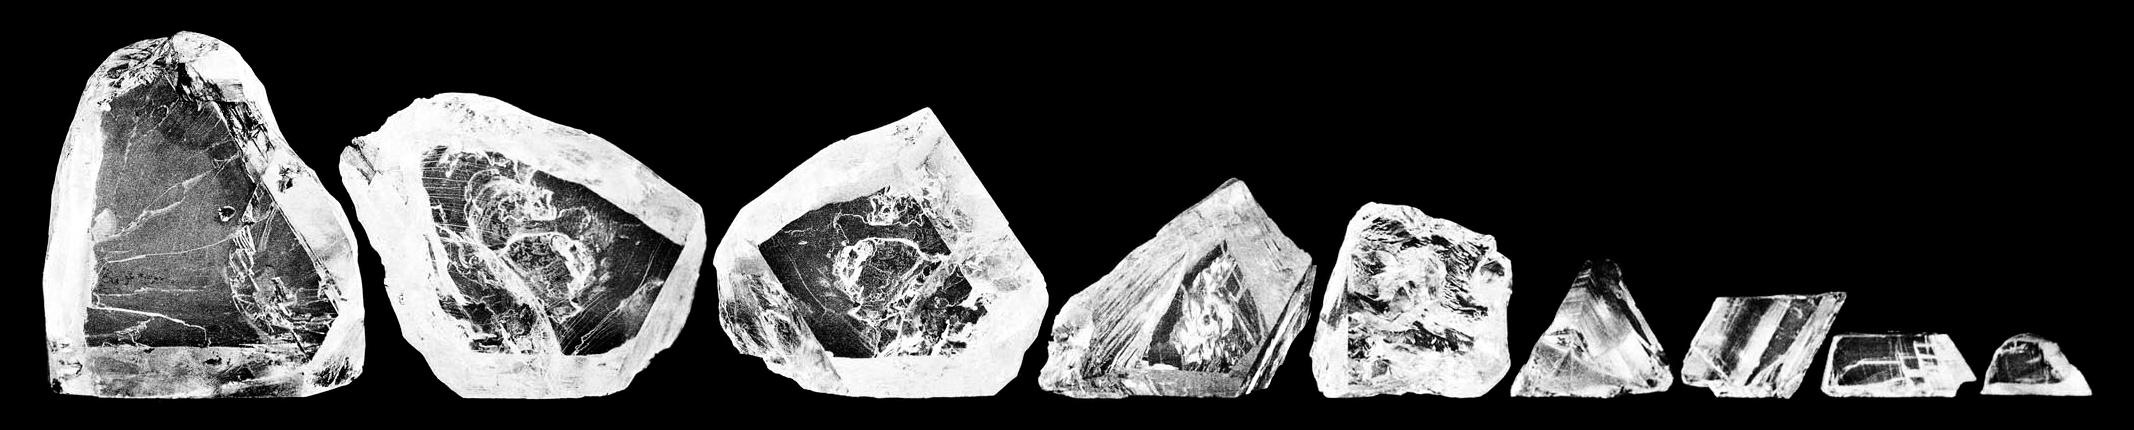 Алмаз Куллинан разбитый на 9 частей